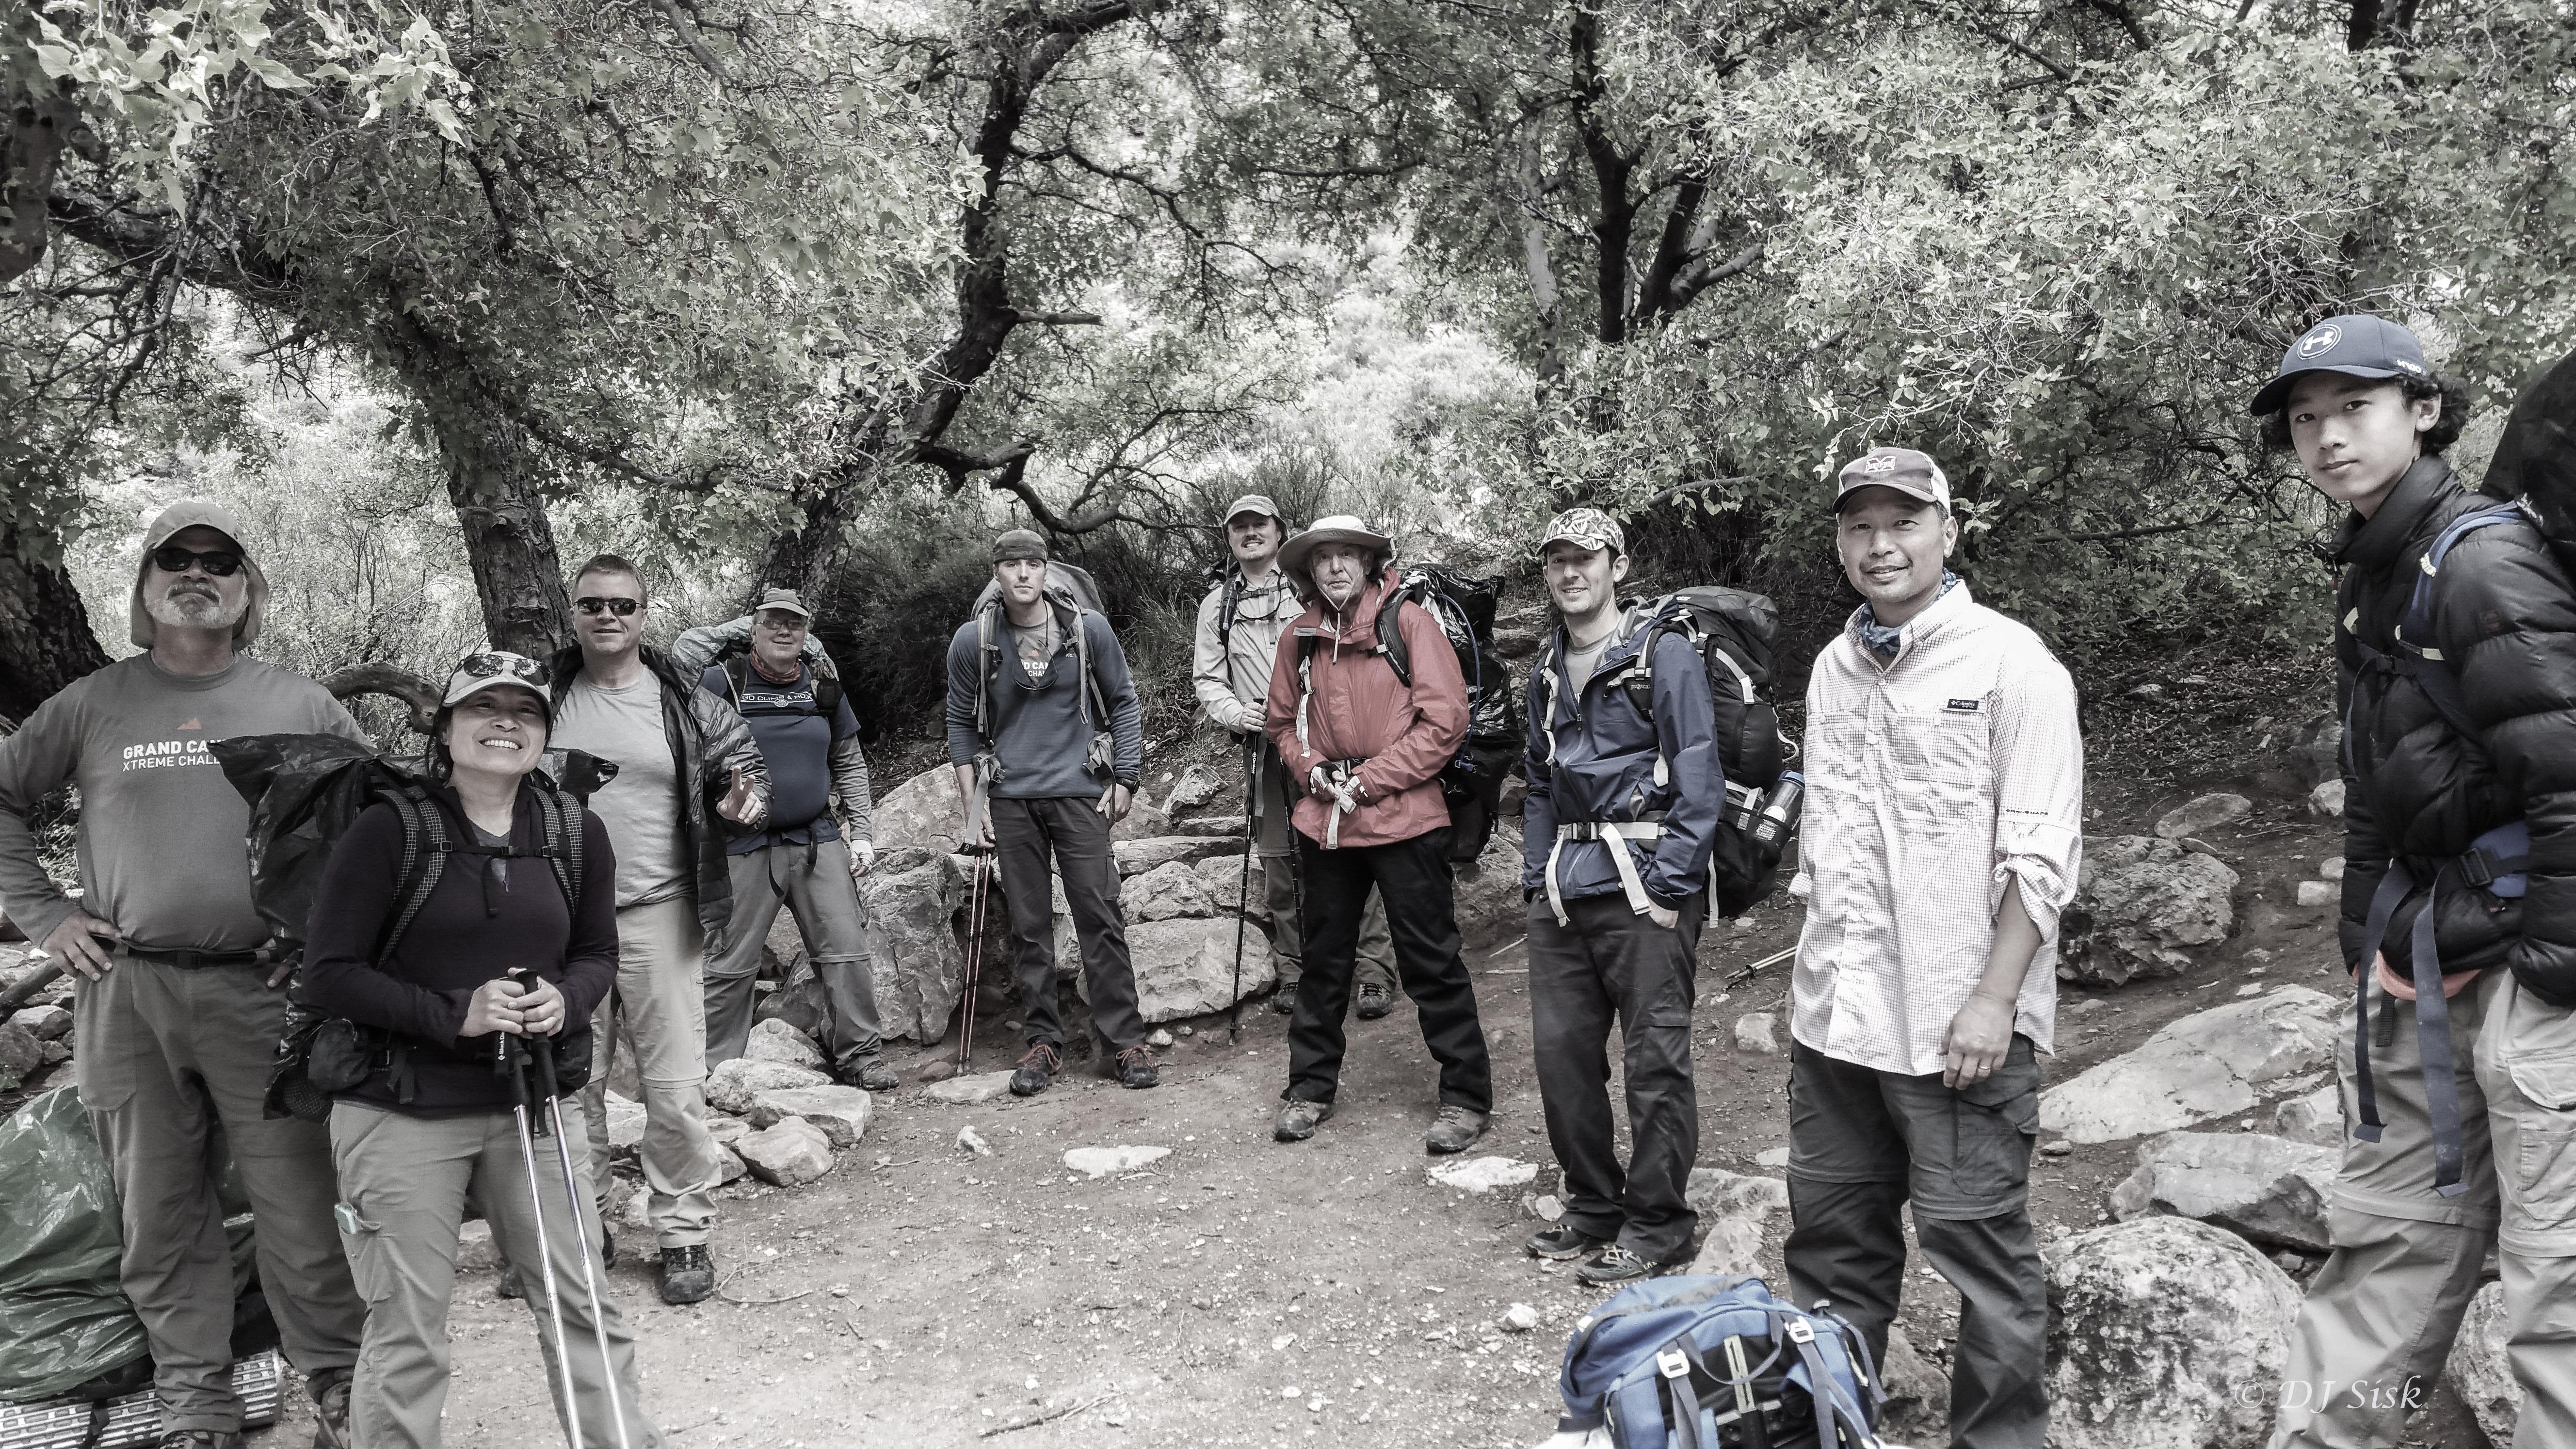 Grand Canyon Challenge Team